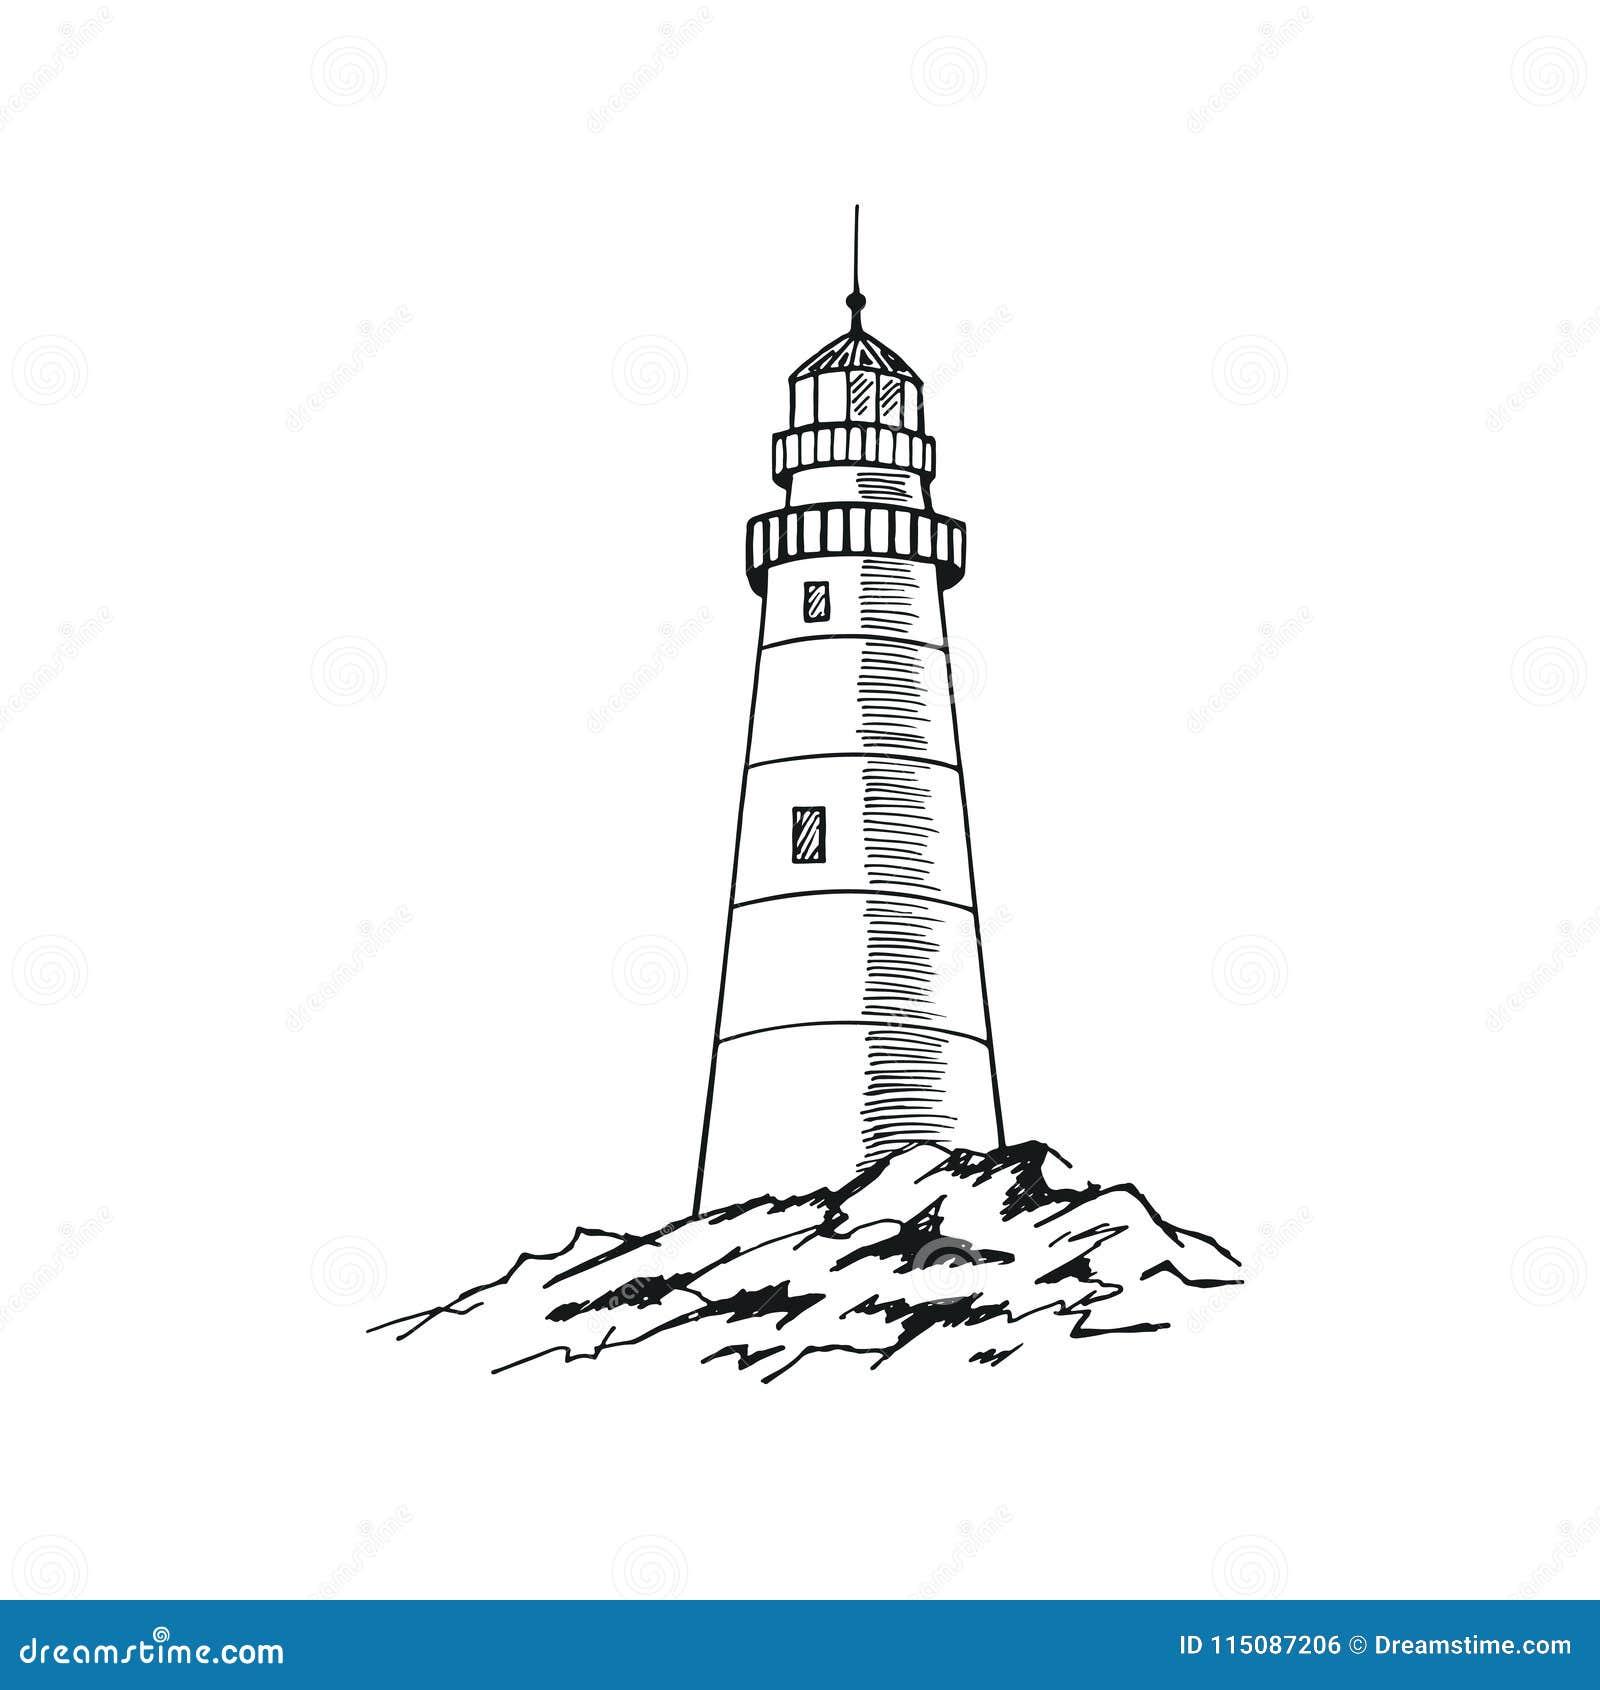 ПÐ?Ñ-‡ Ð°Ñ 'ÑŒThe-Leuchtturmskizze Hand gezeichnete vektorabbildung